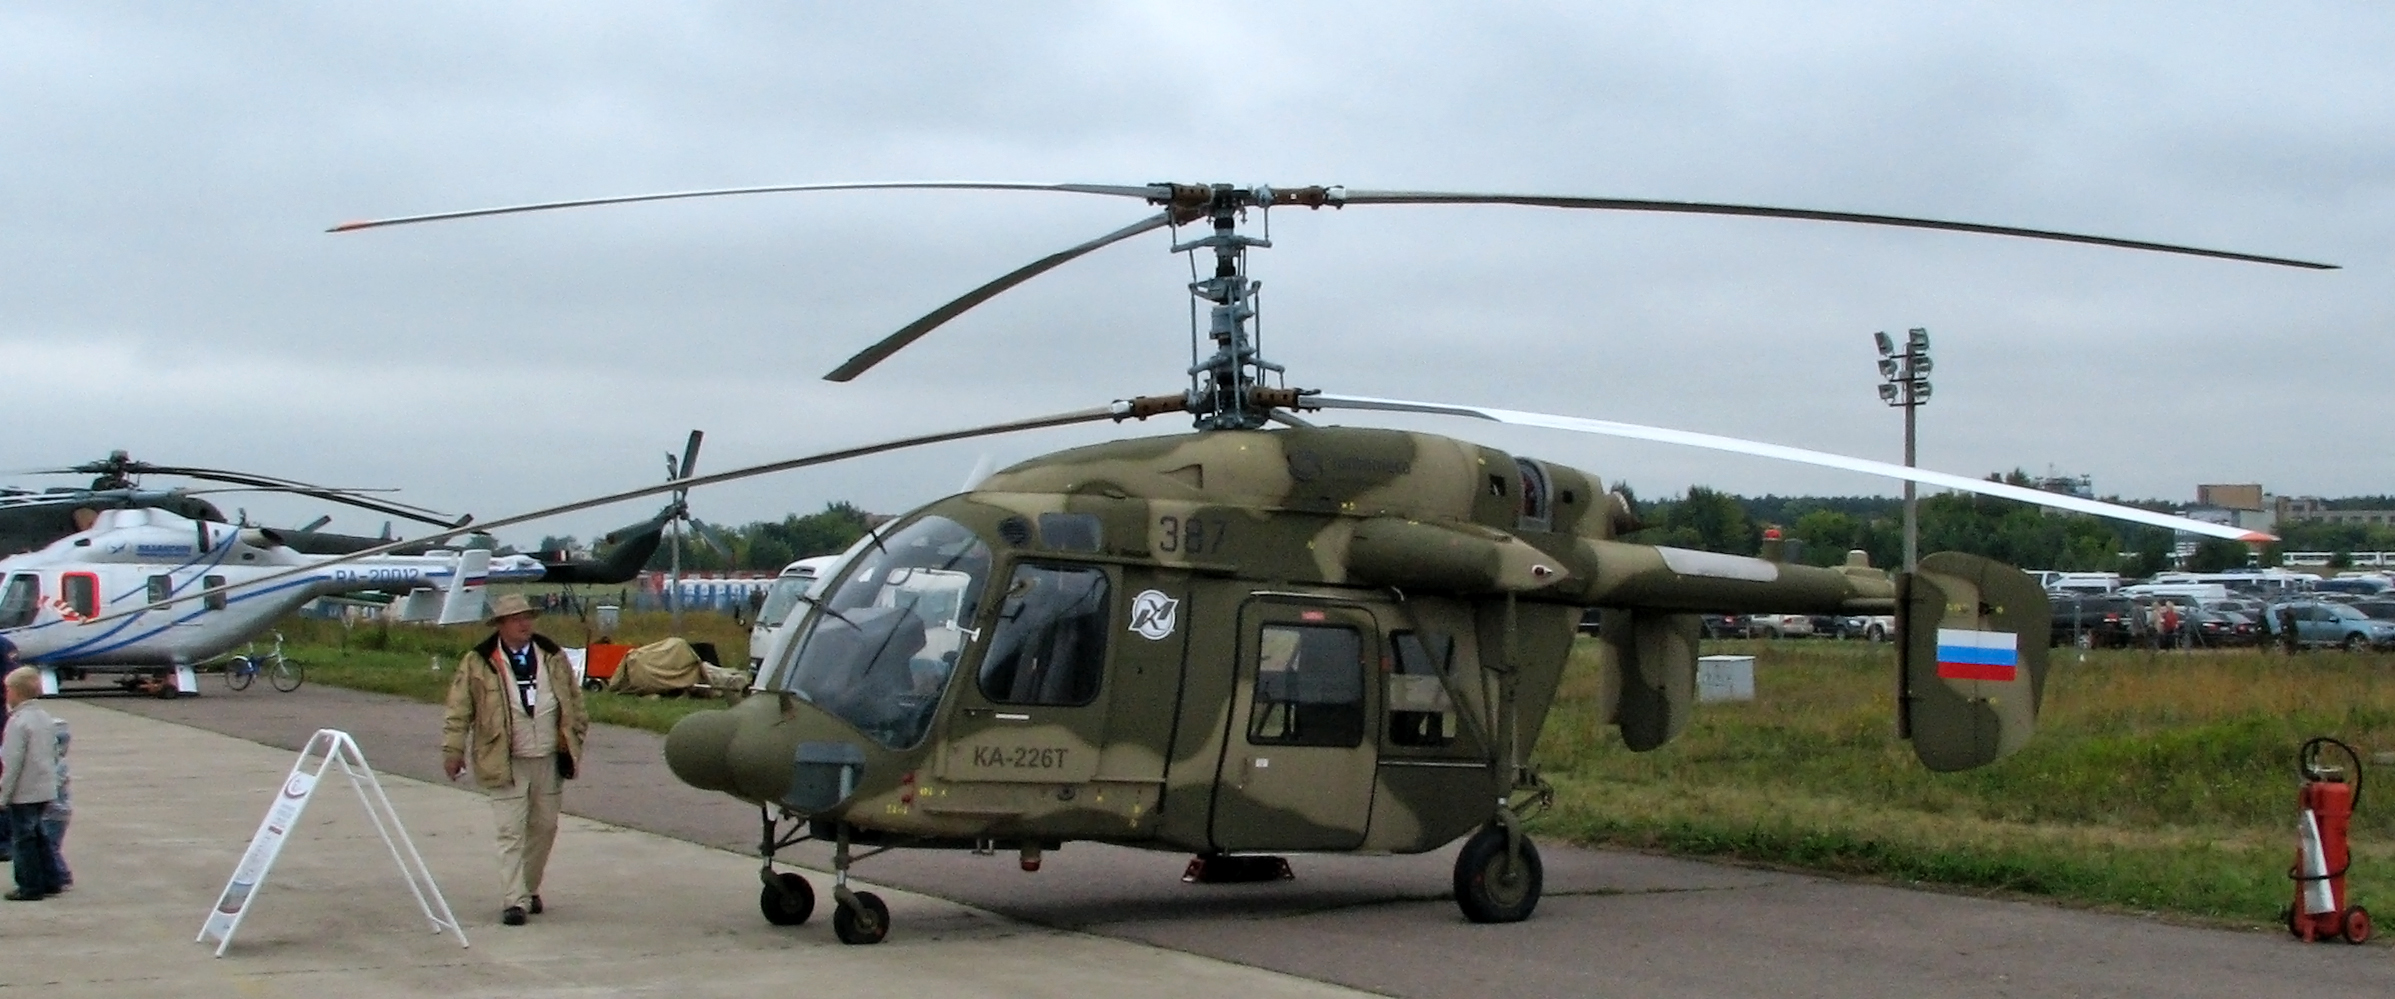 File:Kamov Ka-226T at the MAKS-2009 (01).jpg - Wikimedia Commons